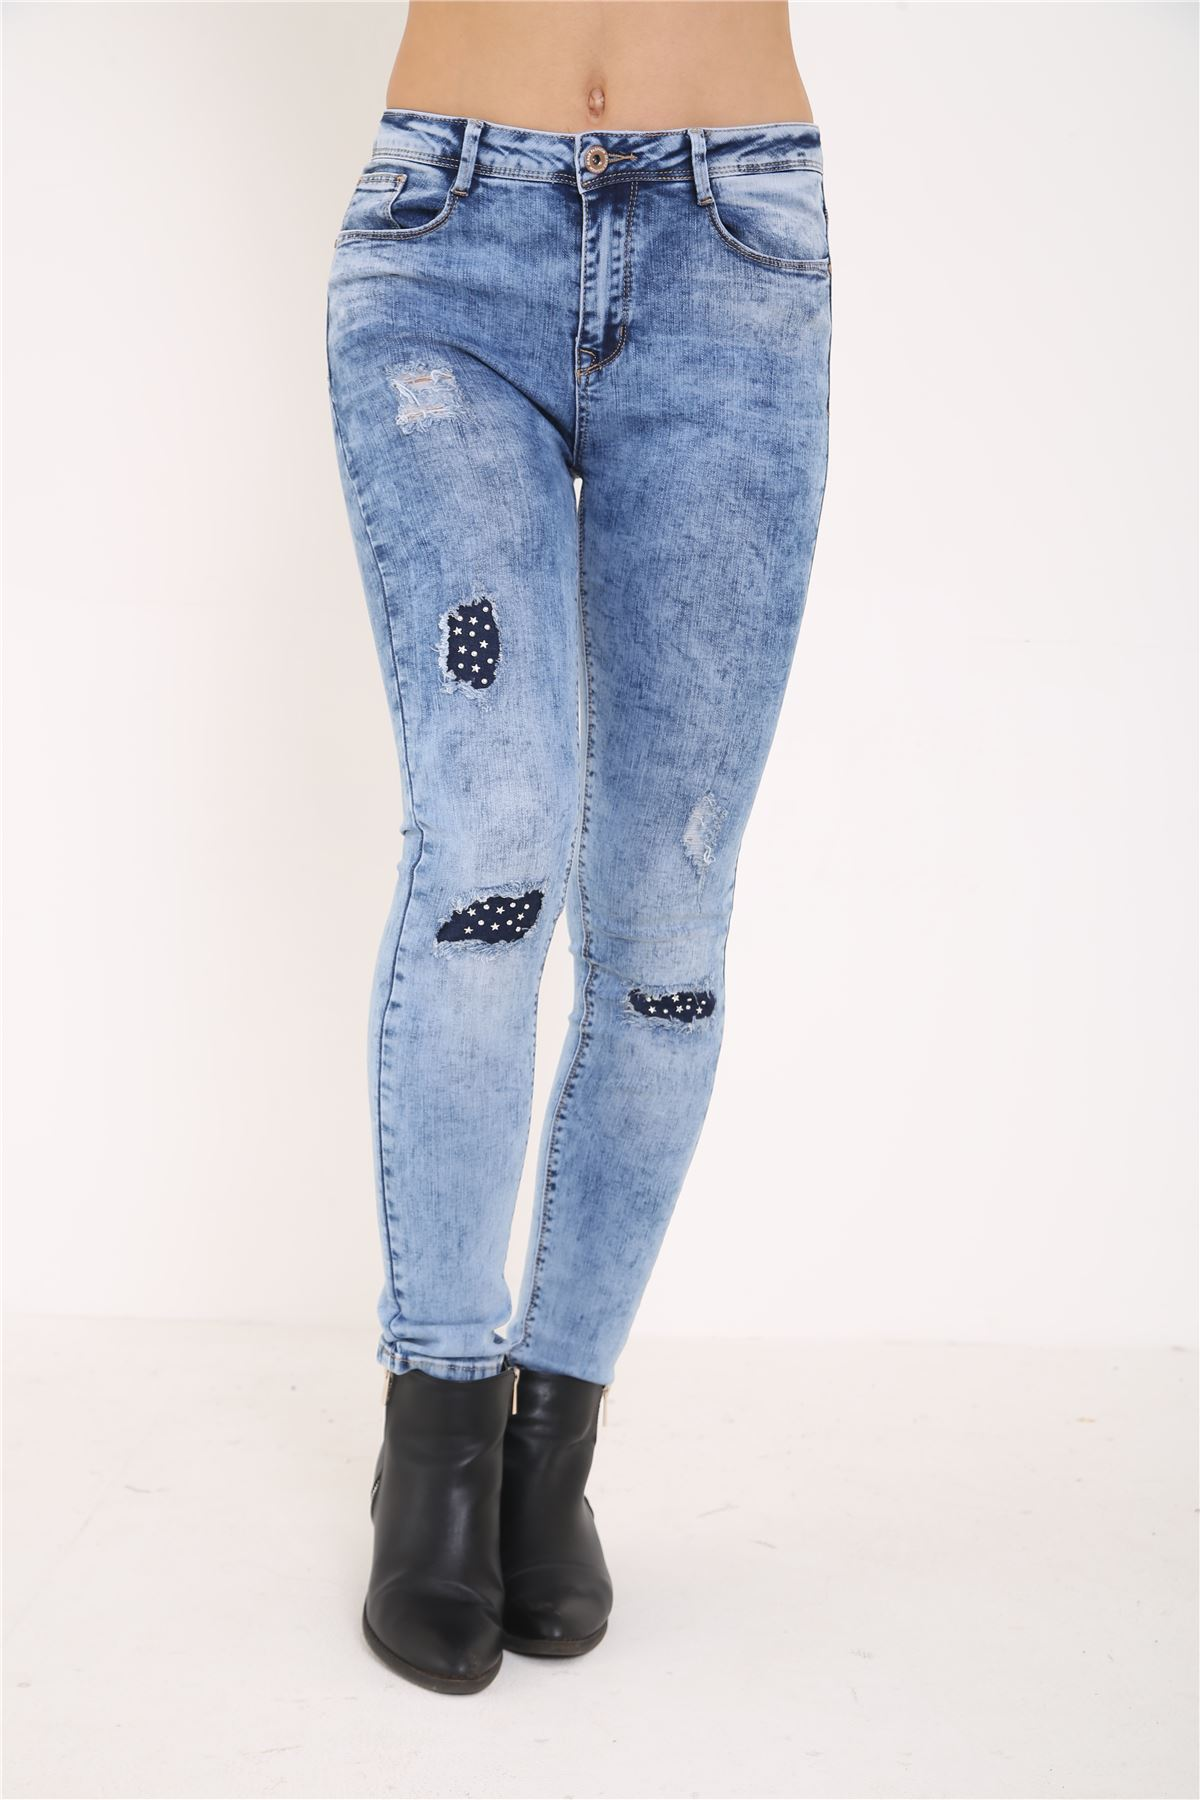 Acid wash jeans fashion 64